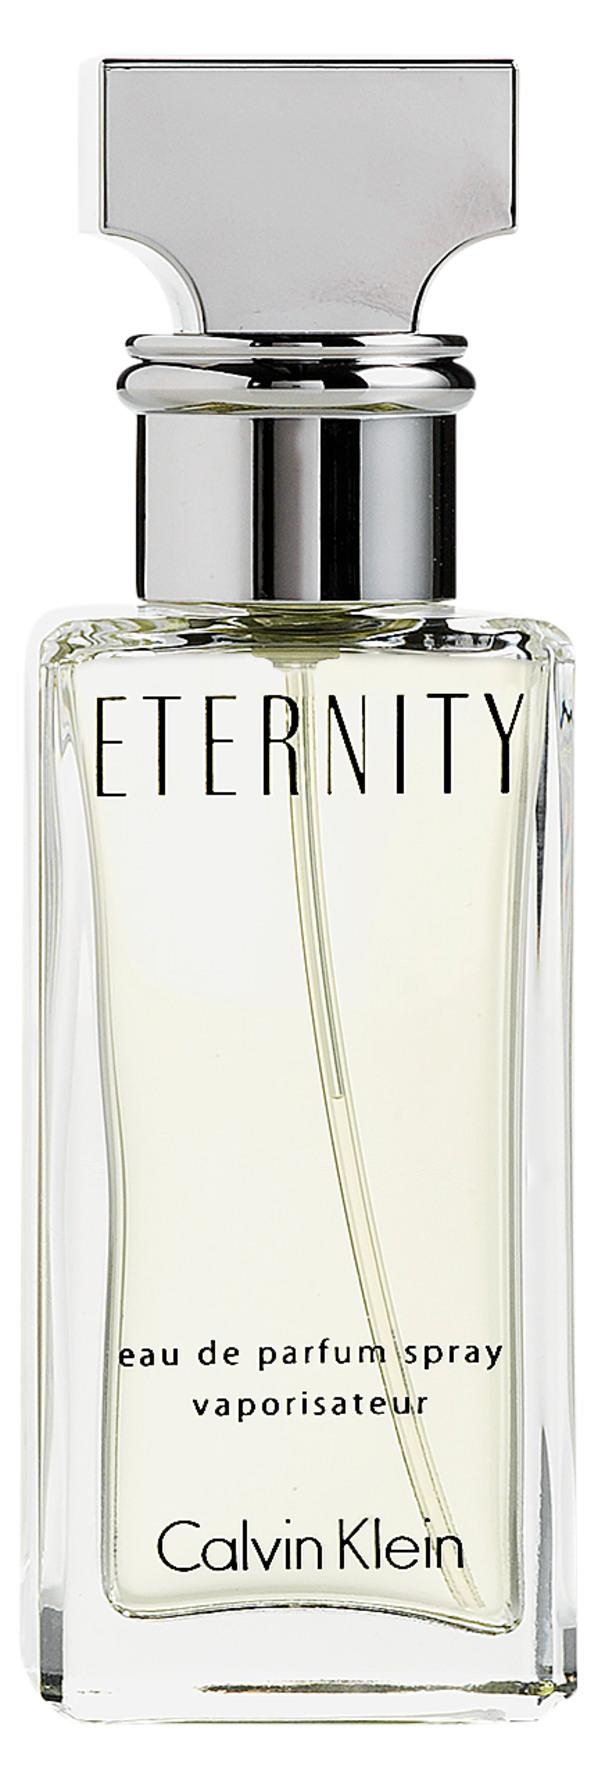 Ml Klein Eau Eternity Parfum Calvin De Woman 30 JTlK1cF